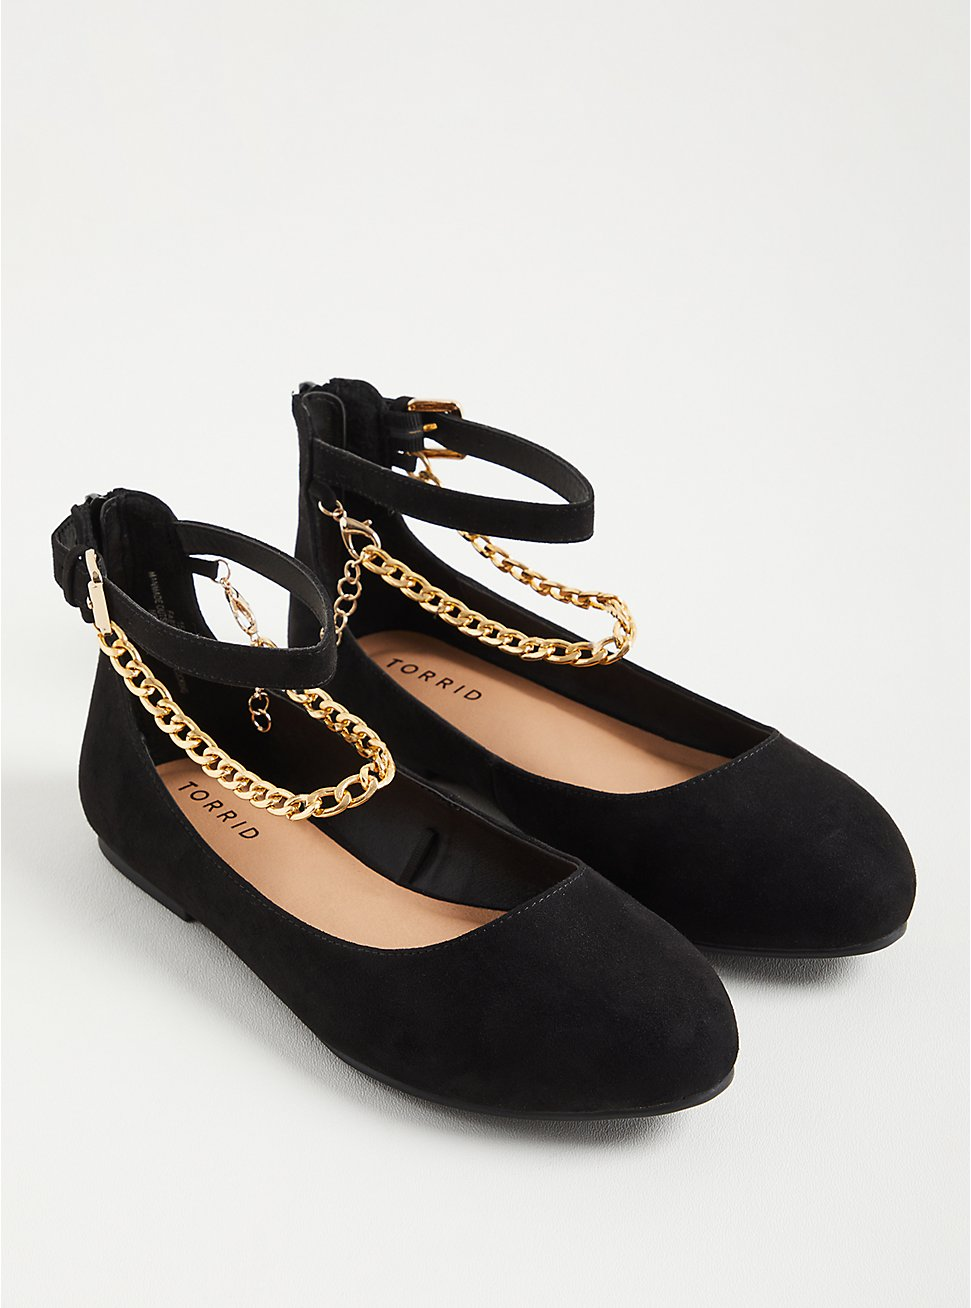 Ankle Chain Flat - Faux Suede Black (WW), BLACK, hi-res